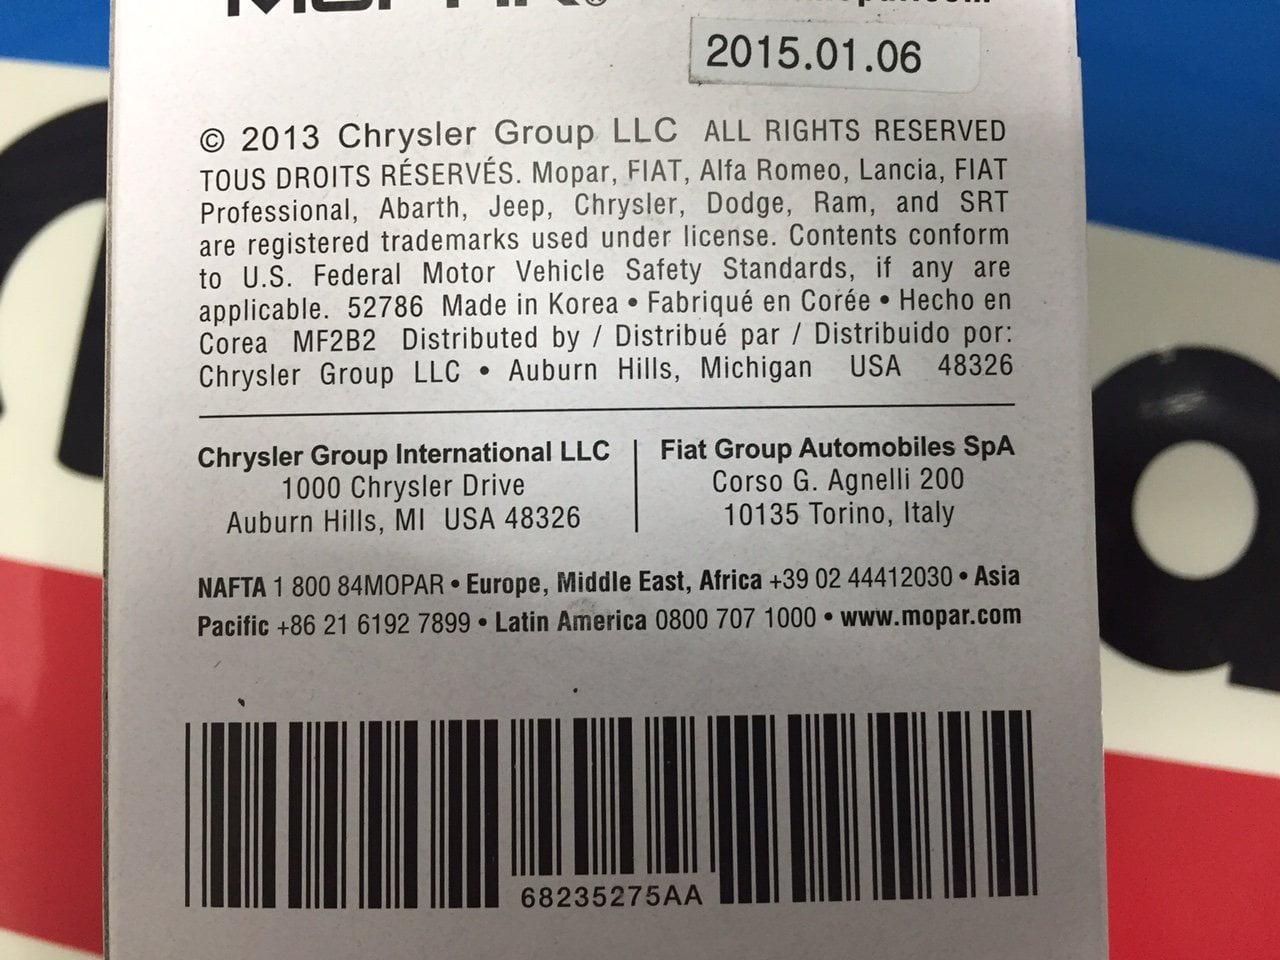 6823 5275aa Fuel Filter By Mopar 2013 Chrysler